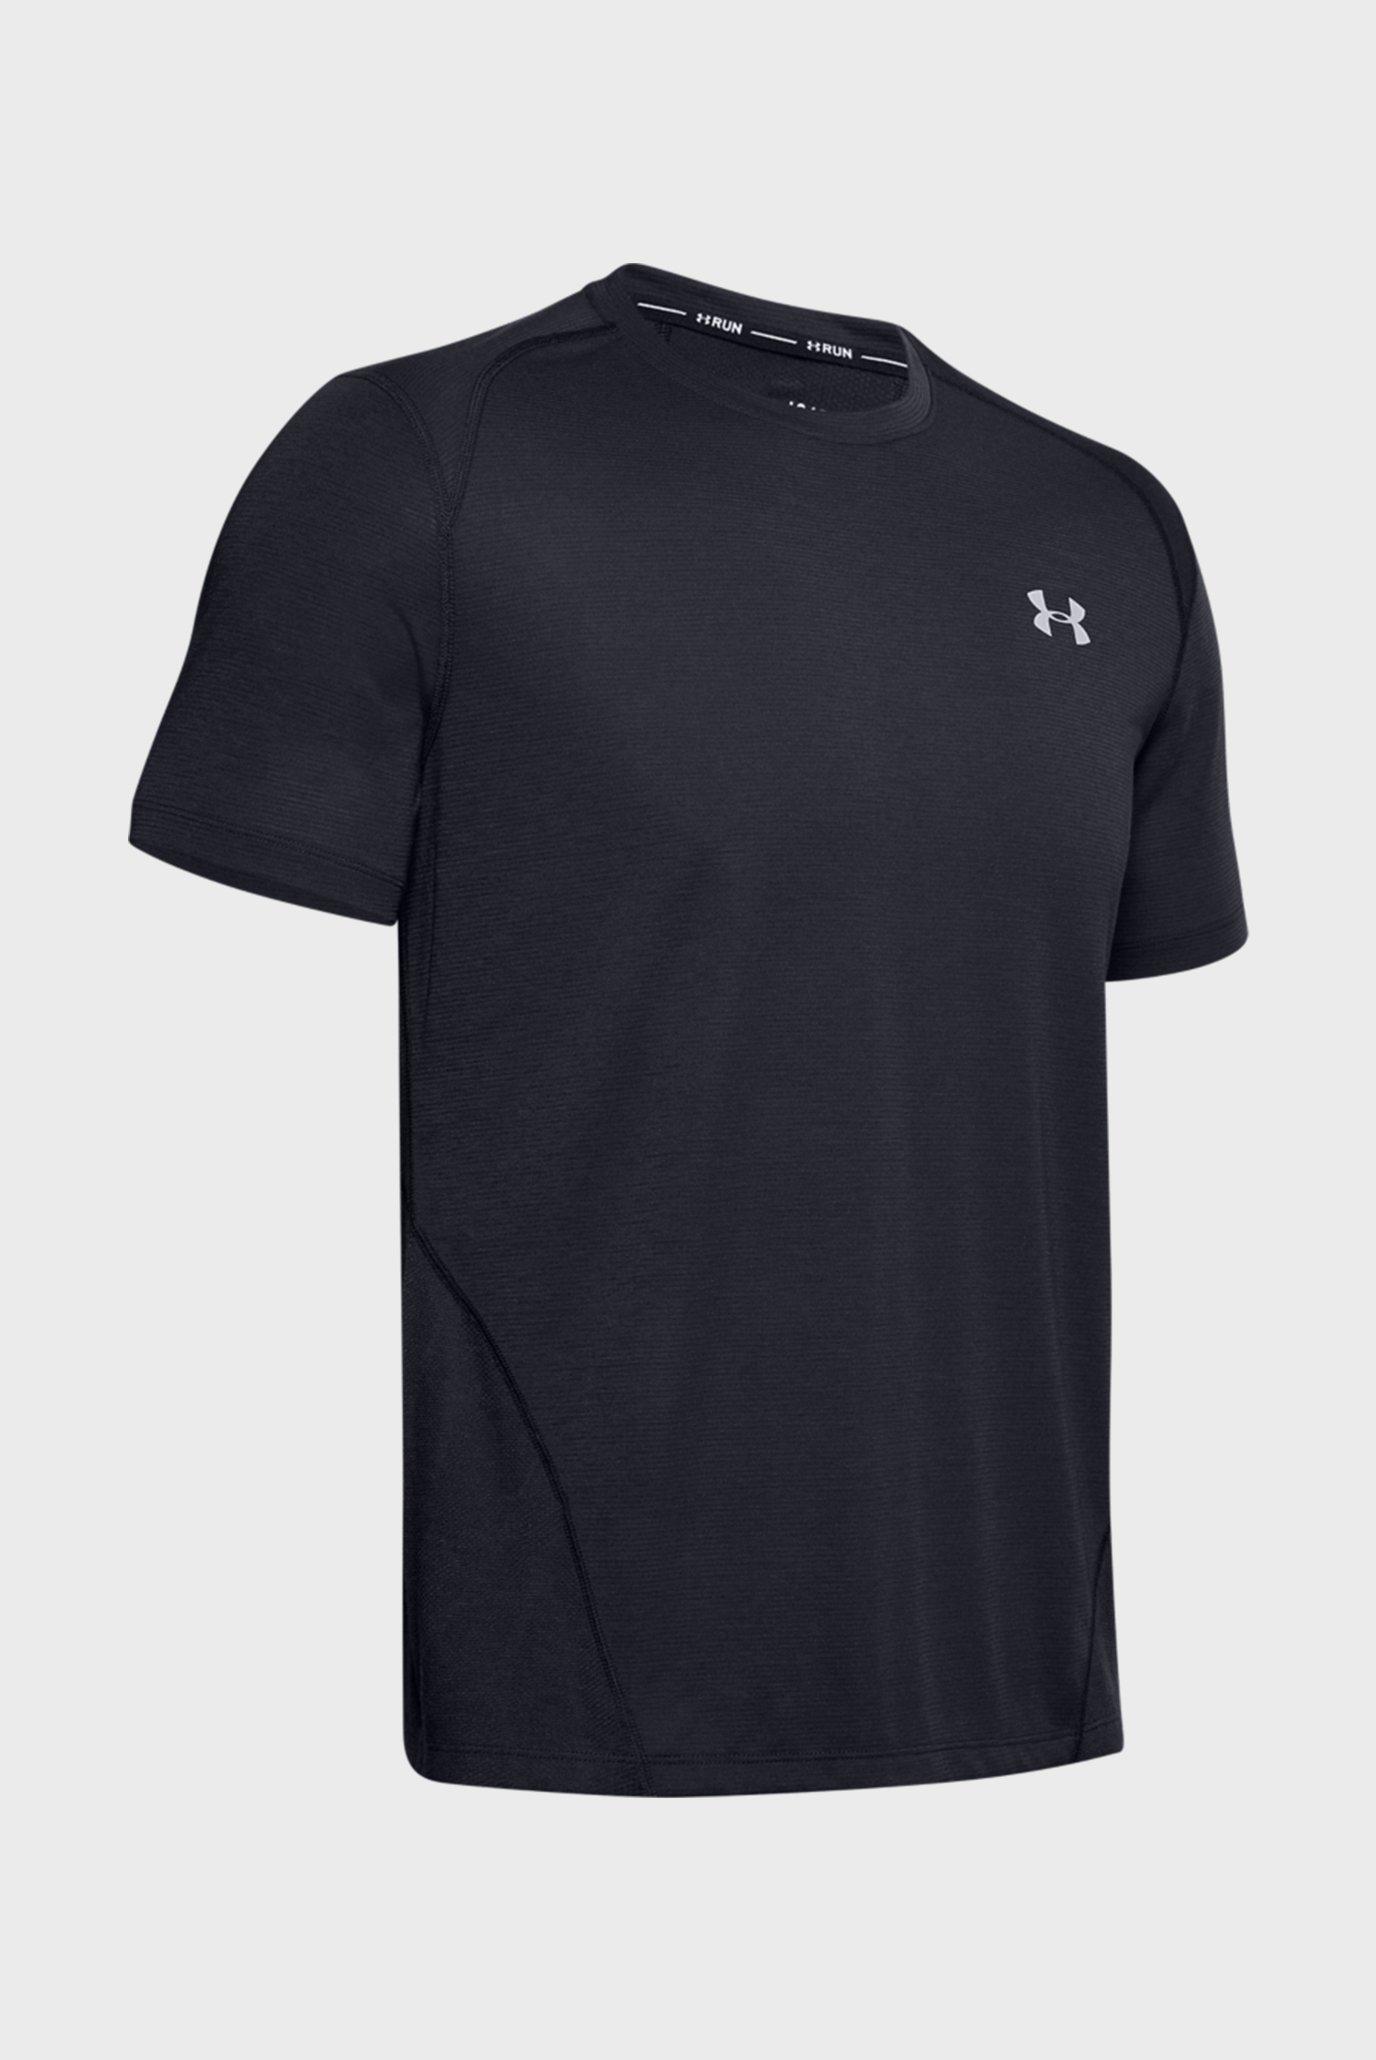 Мужская черная футболка M UA Streaker 2.0 Shift Crew Under Armour